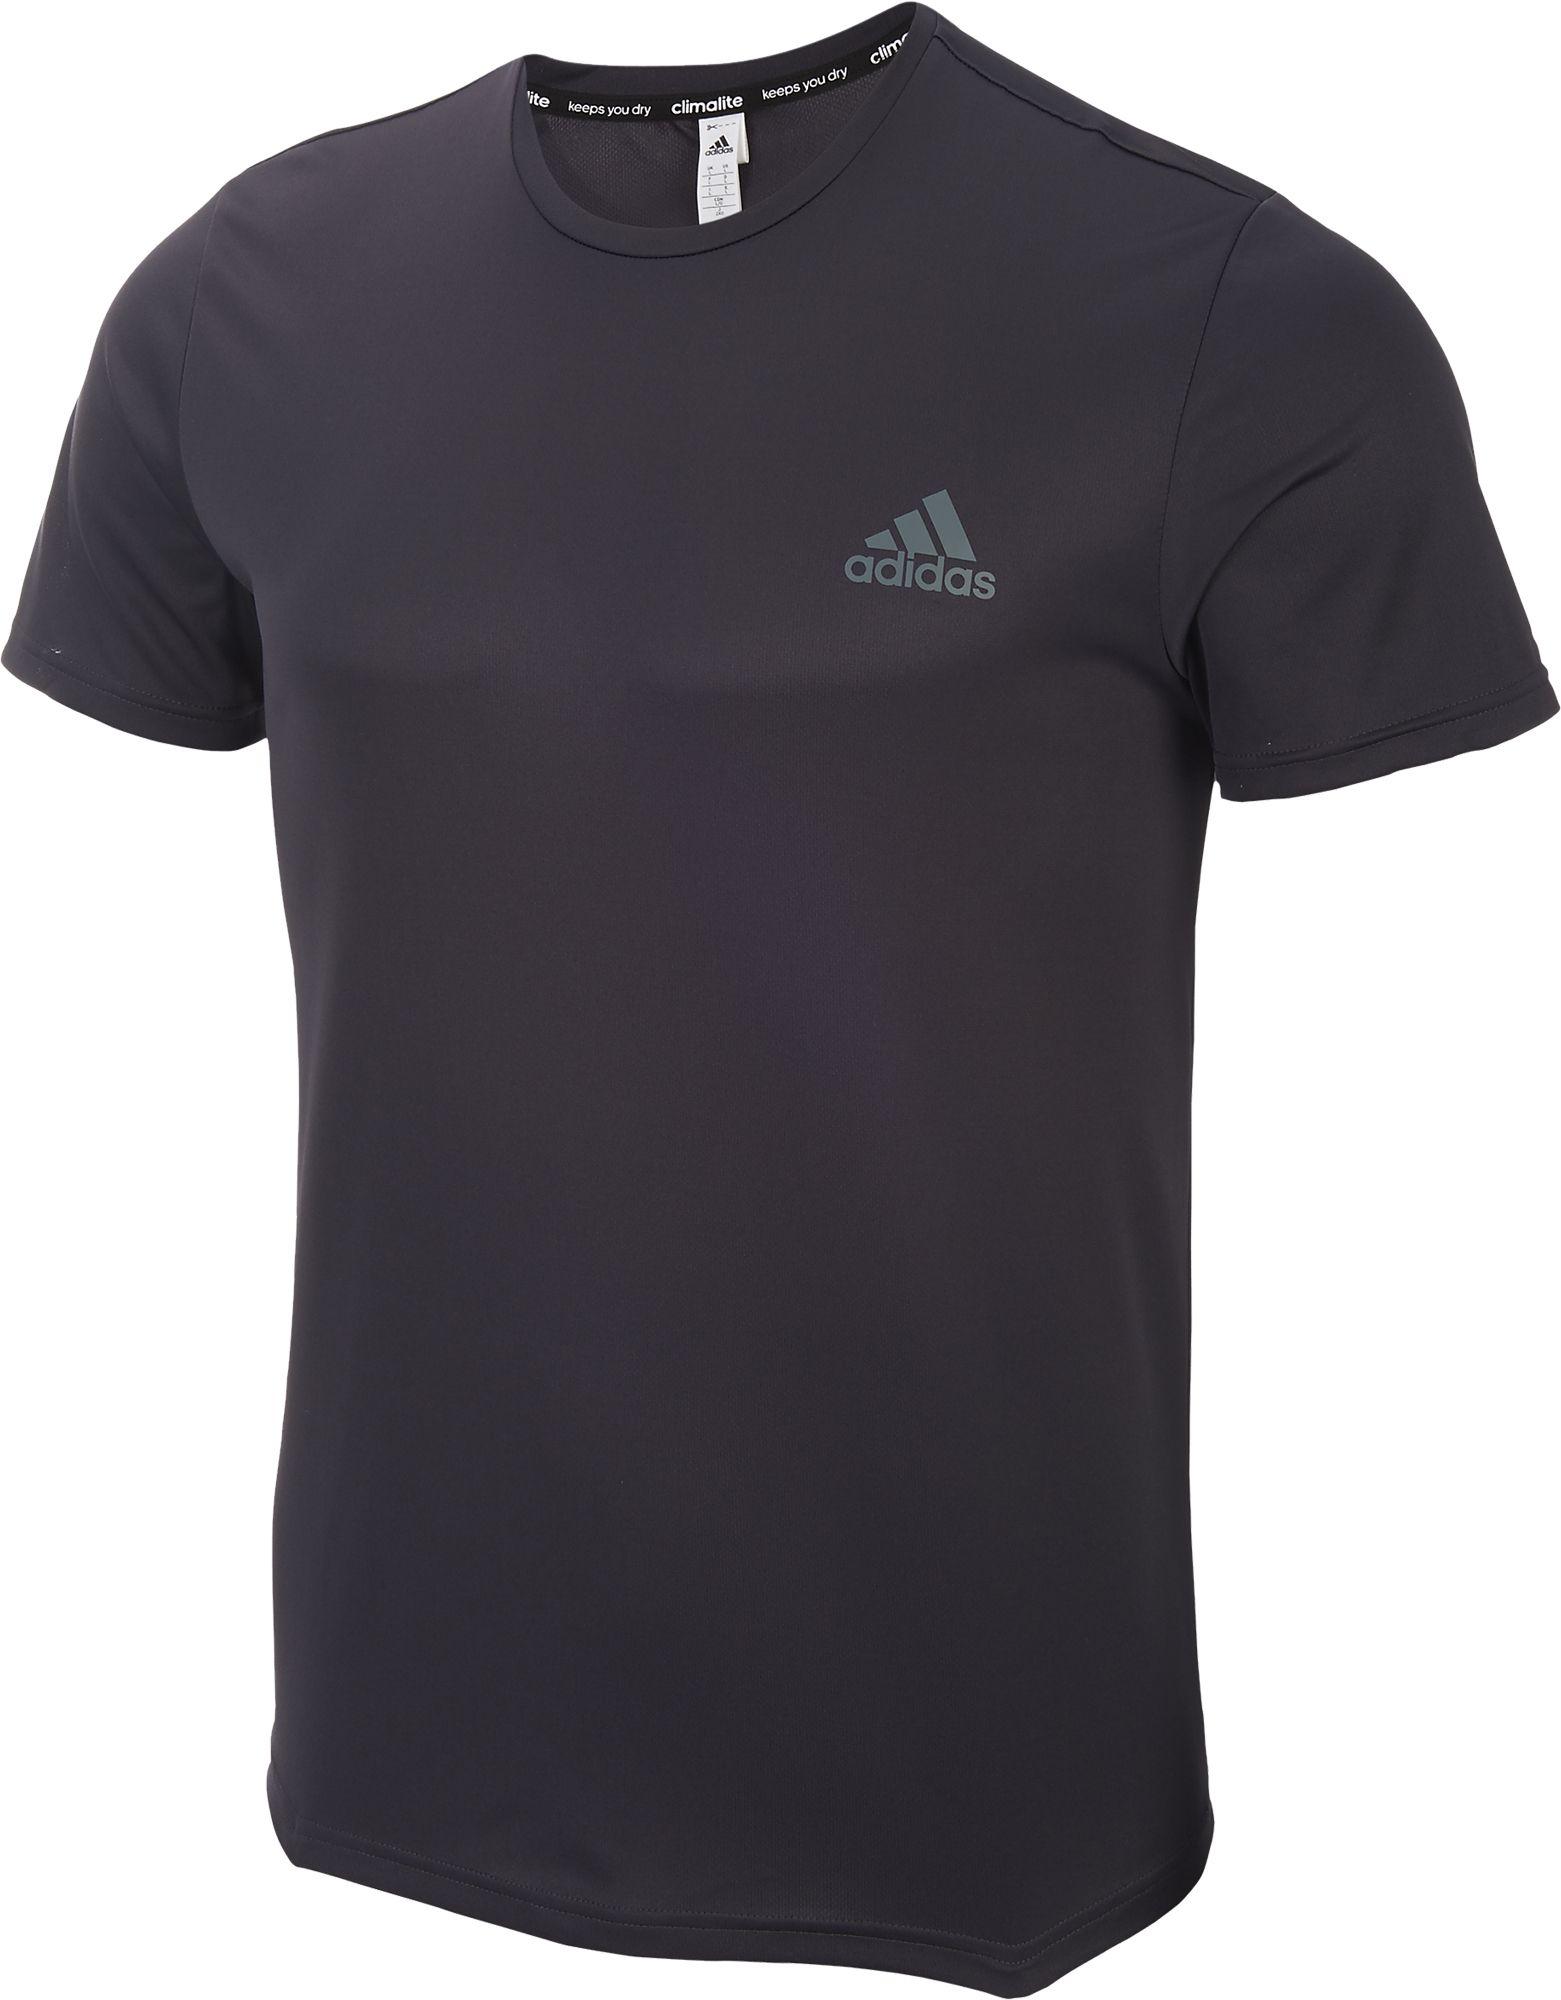 adidas t shirt essential